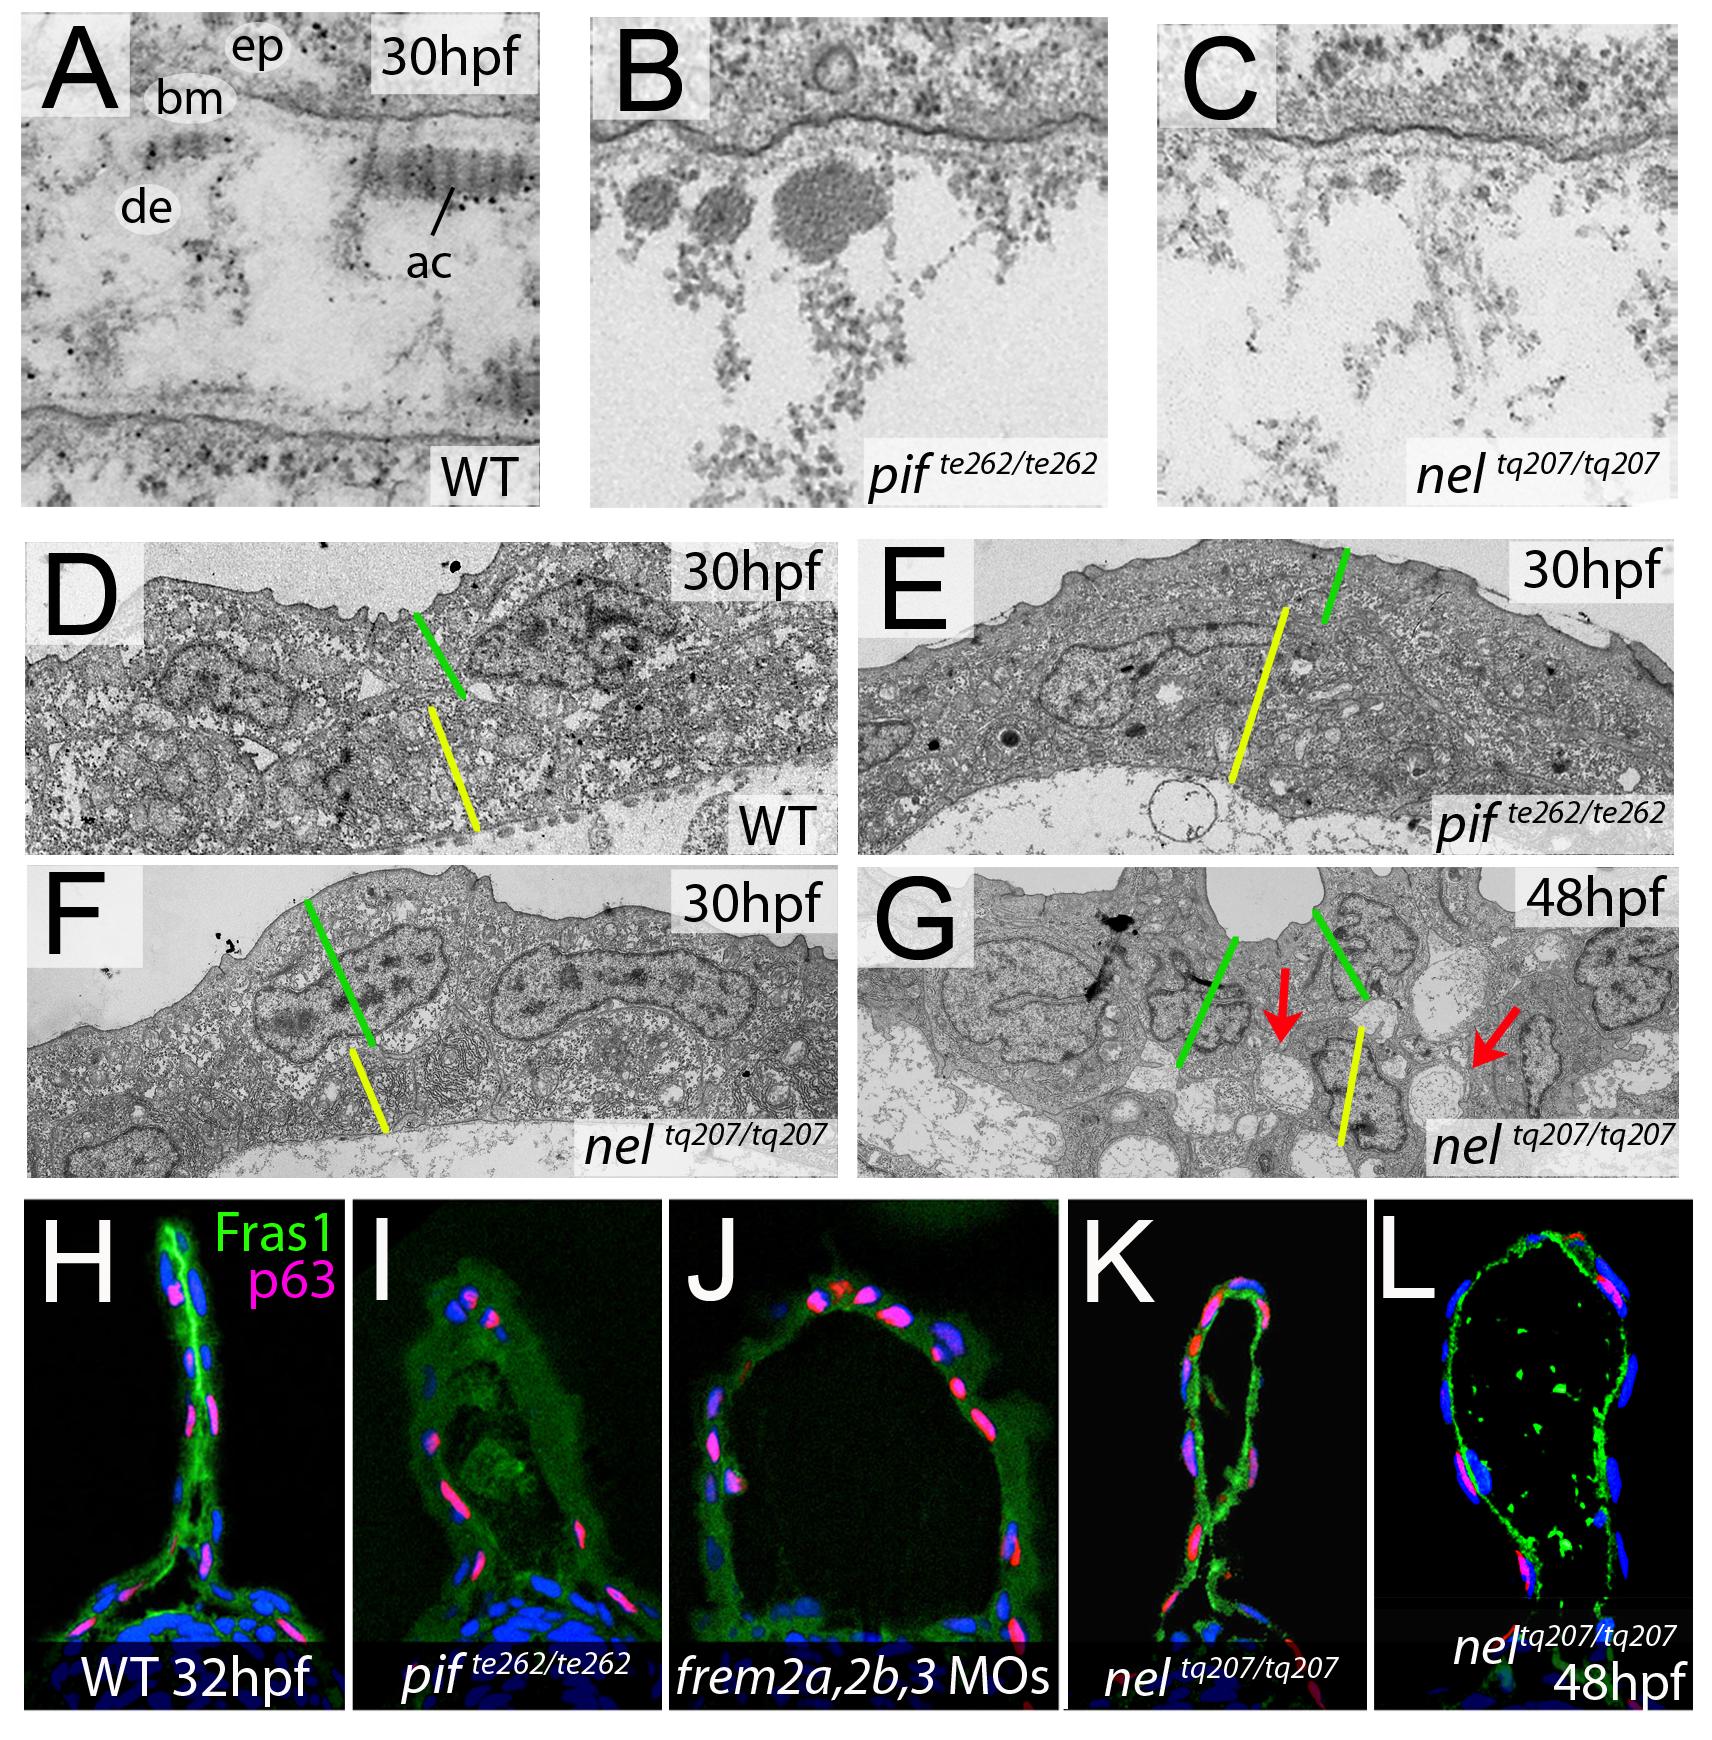 <i>fras1</i> and <i>hmcn1</i> mutants display blister formation at identical sites below the basement membrane; however, in contrast to Frem2/3 proteins, Hmcn1 is dispensable for Fras1 stabilisation.